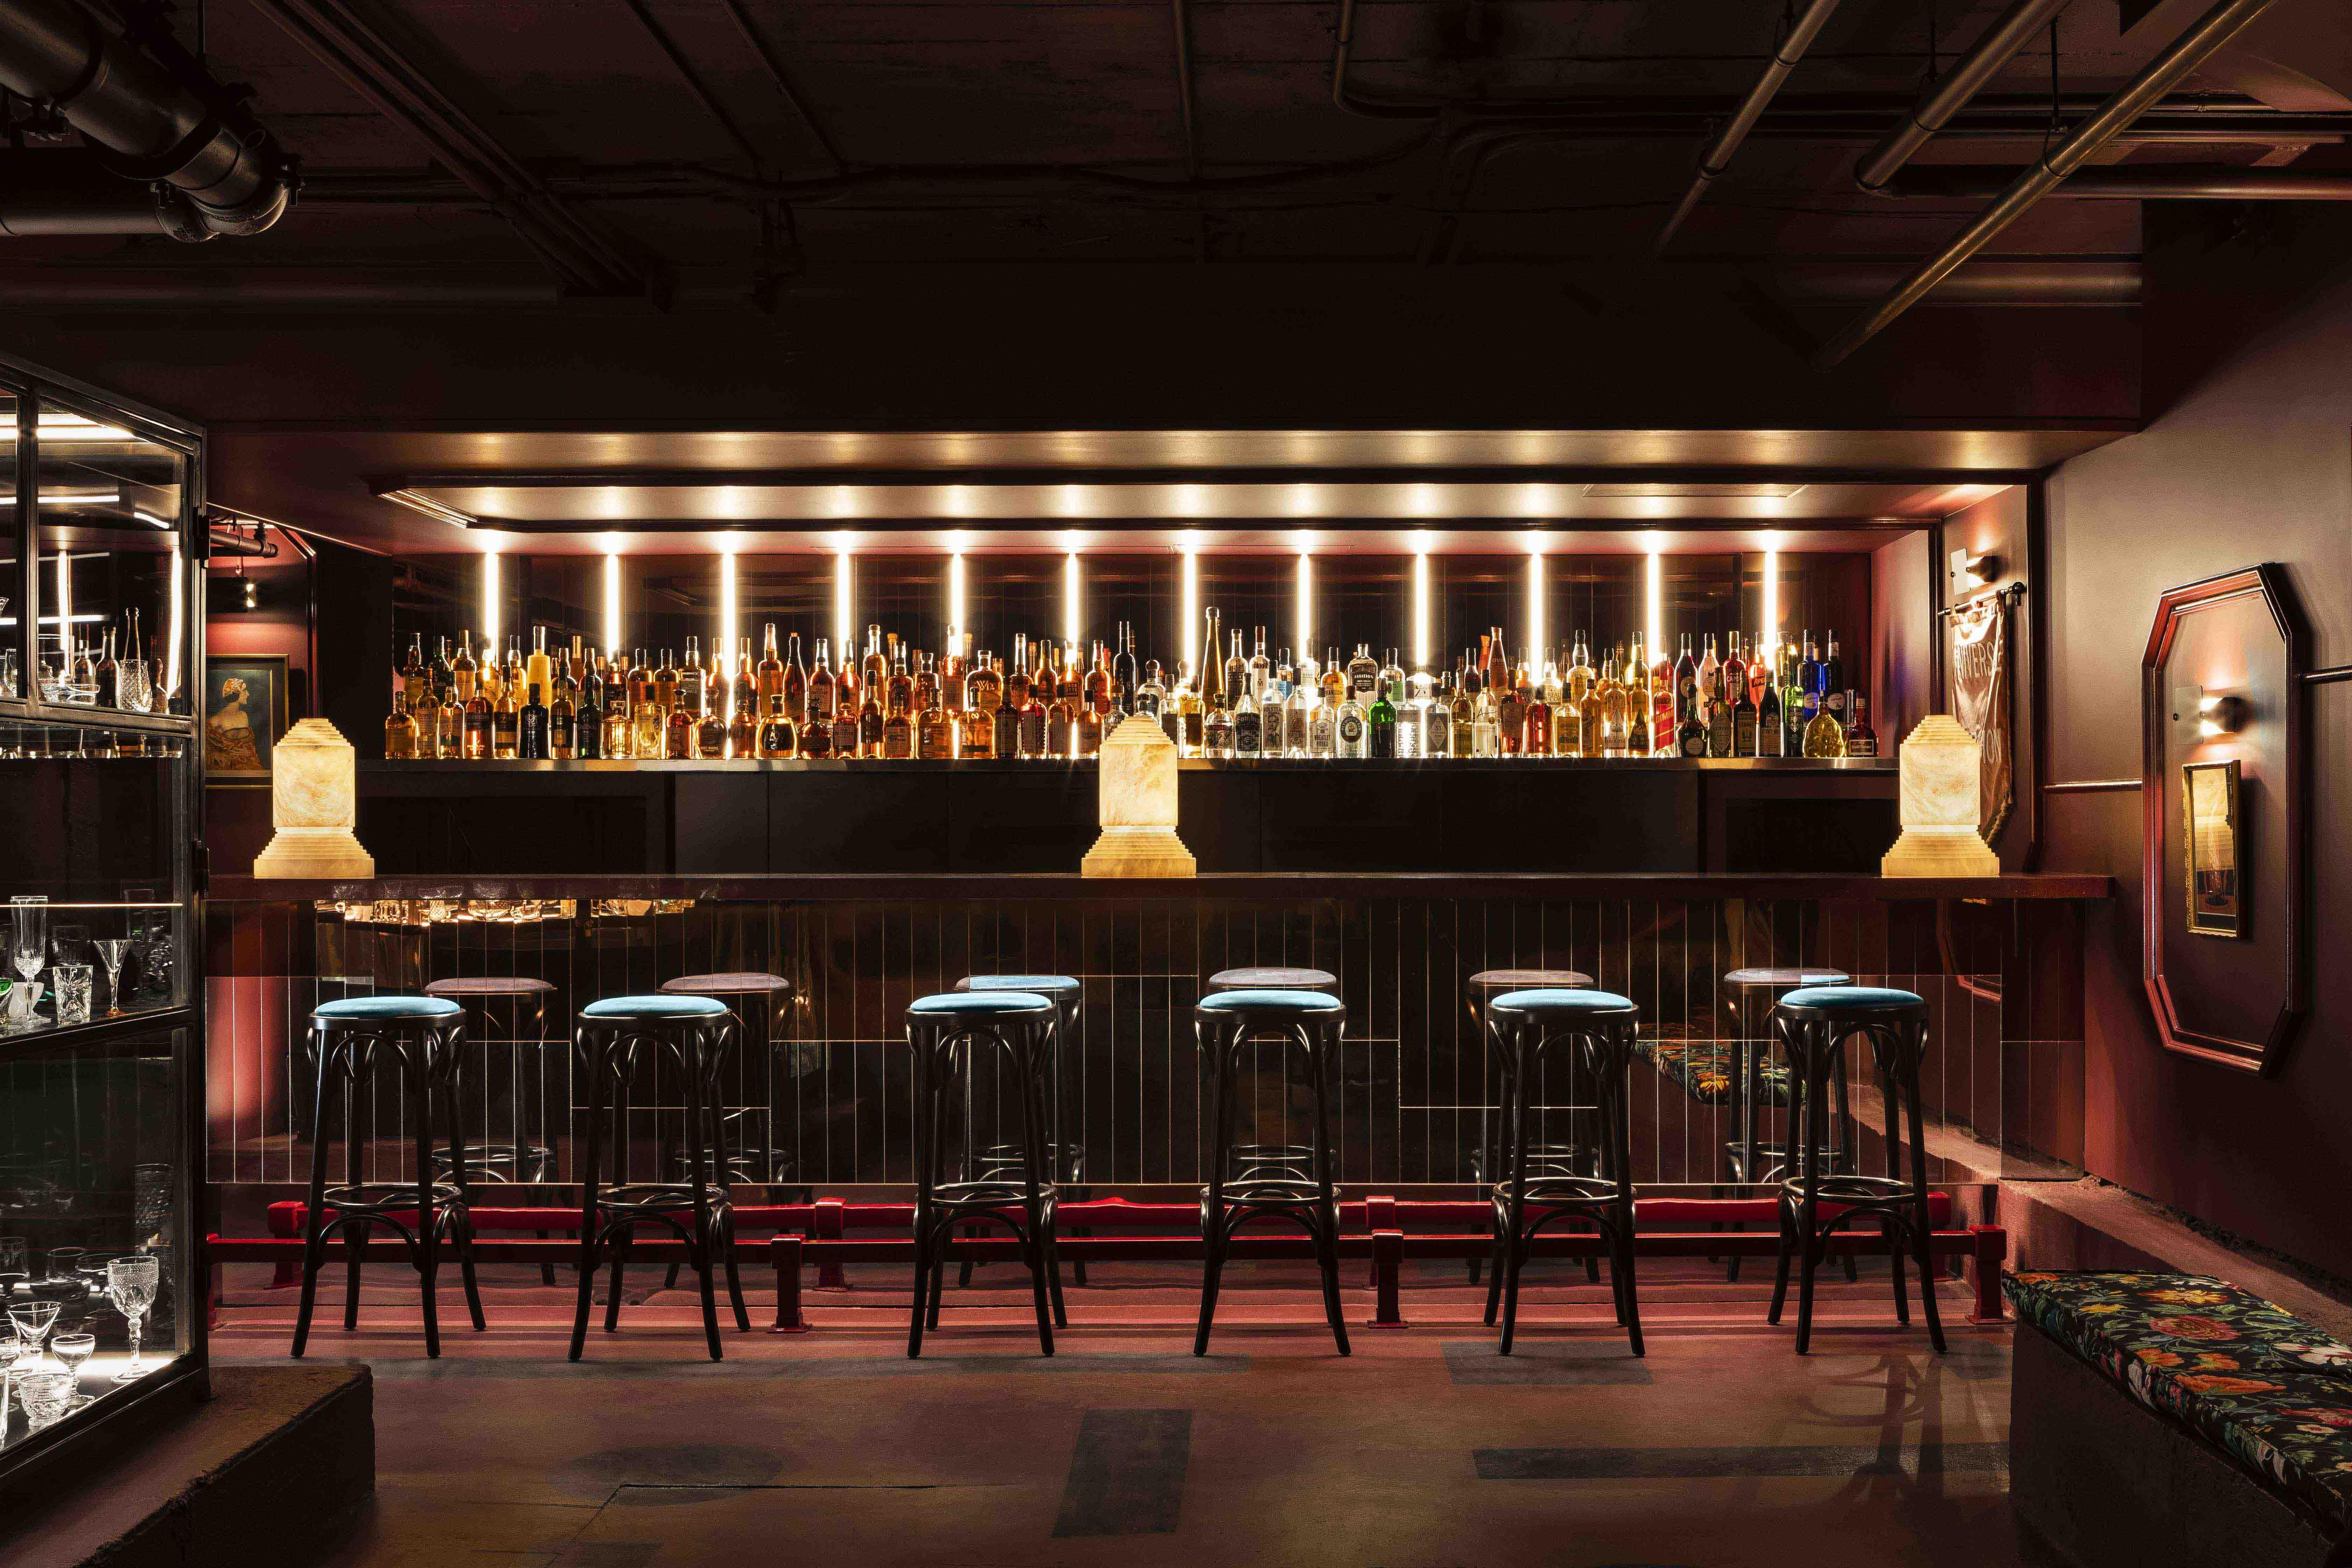 Voysey's stunning bar